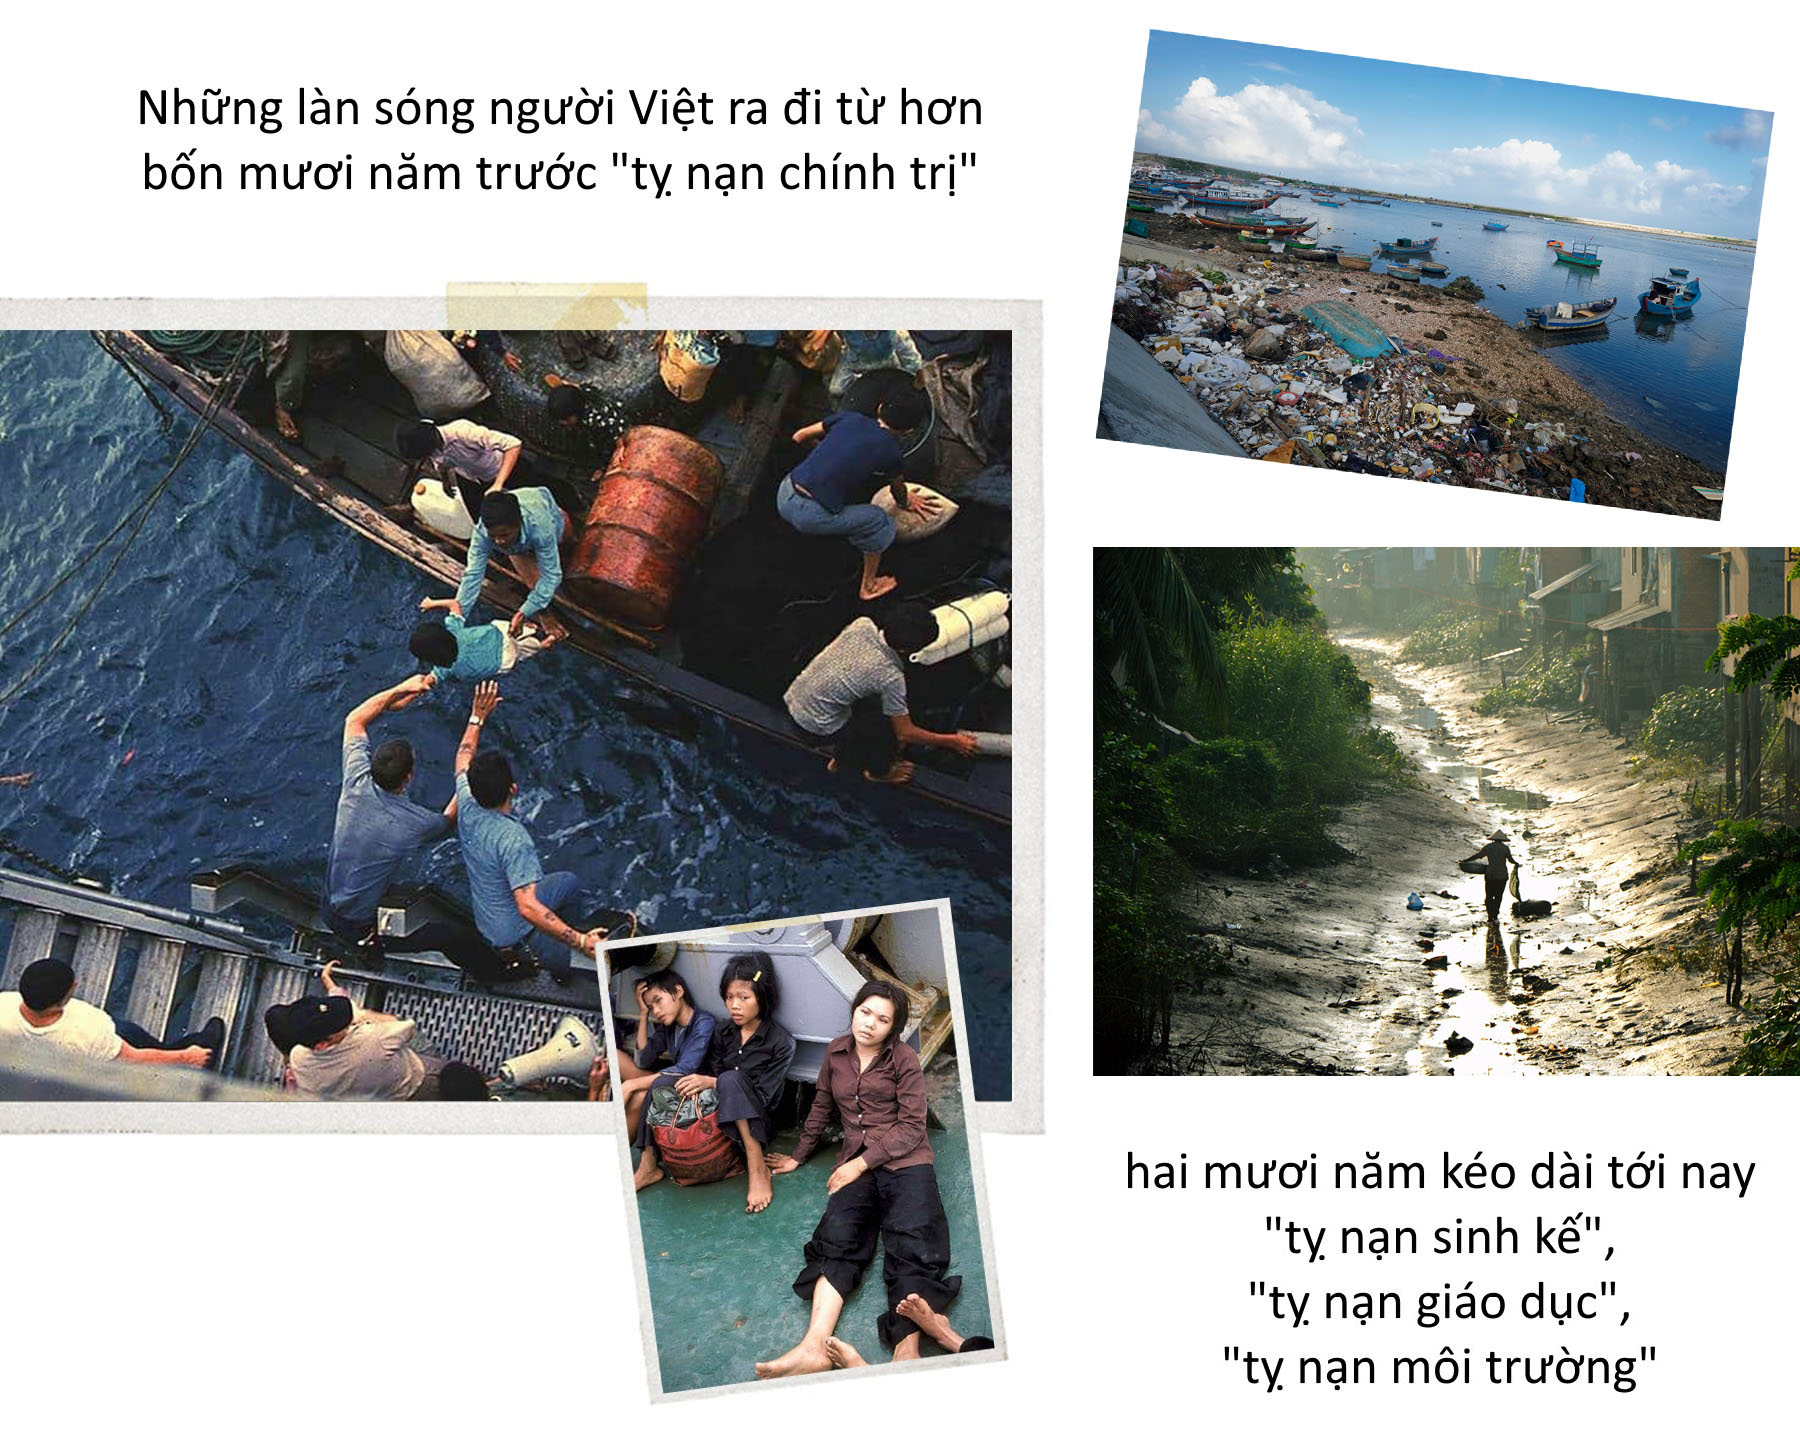 Canh-chim-tha-huong-04